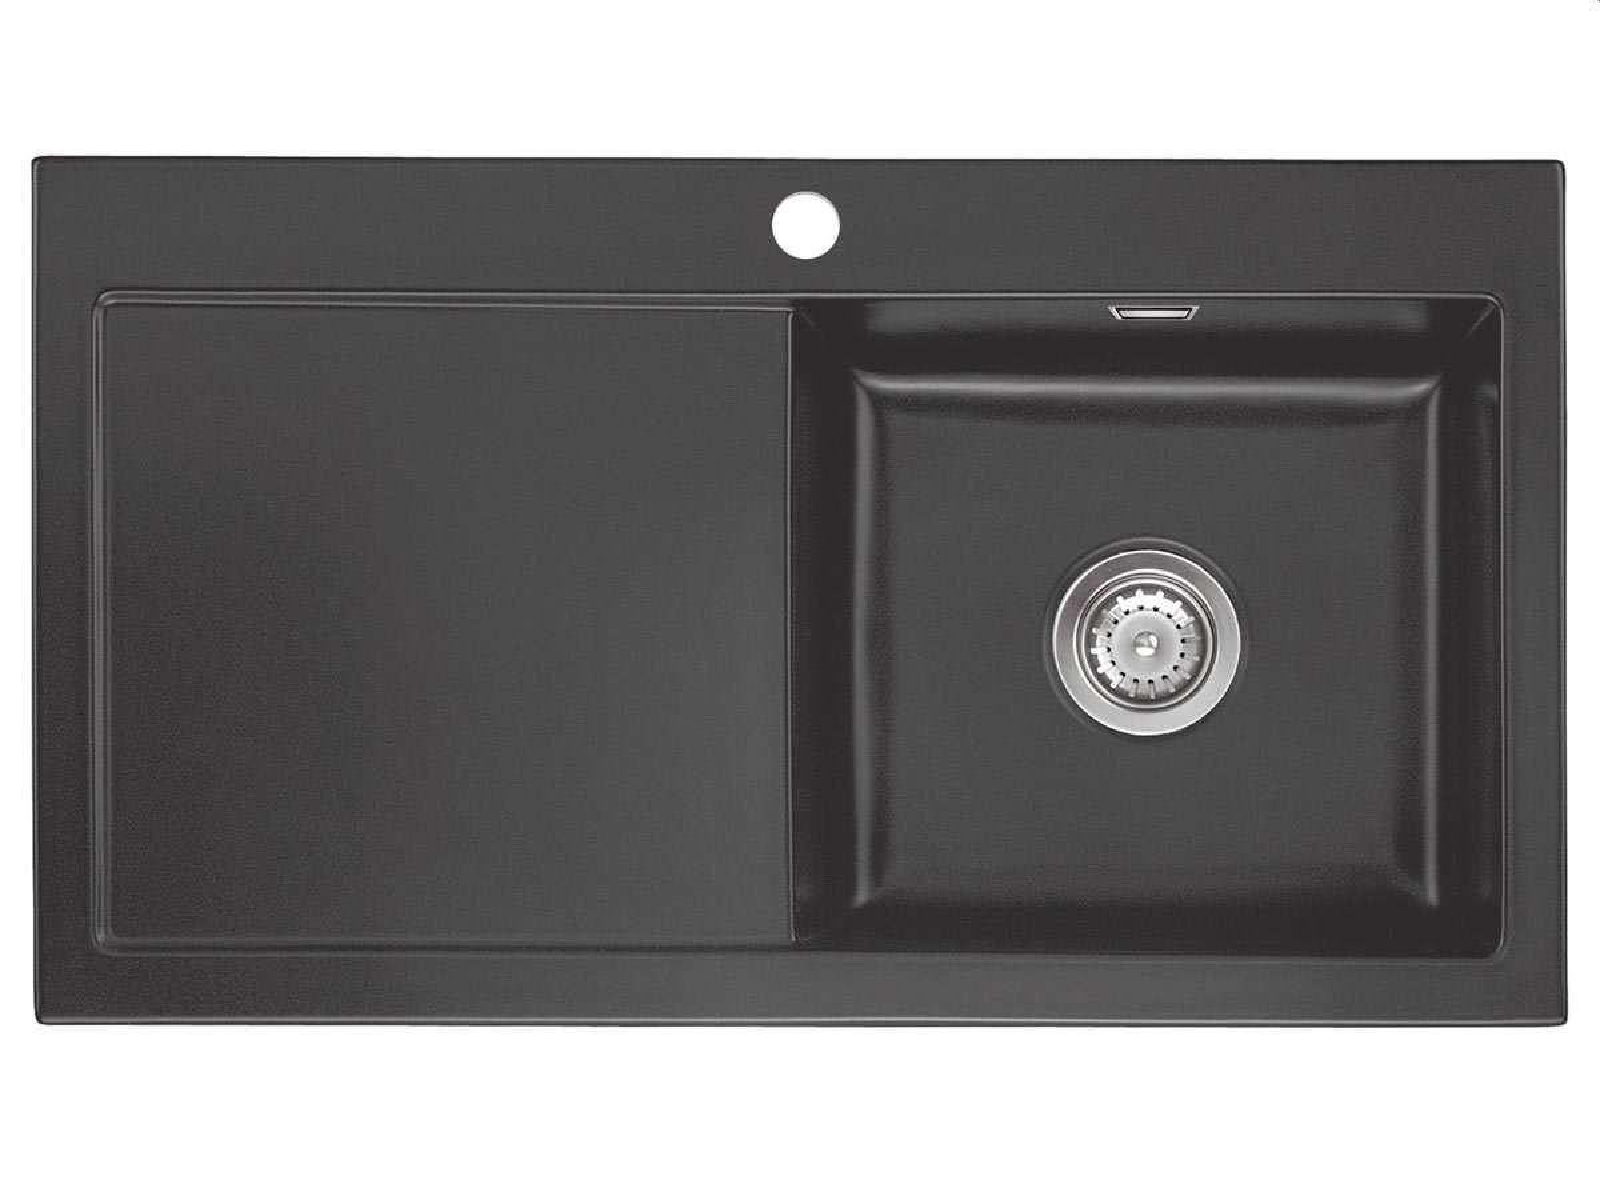 systemceram mera 90 schiefer keramiksp le handbet tigung. Black Bedroom Furniture Sets. Home Design Ideas